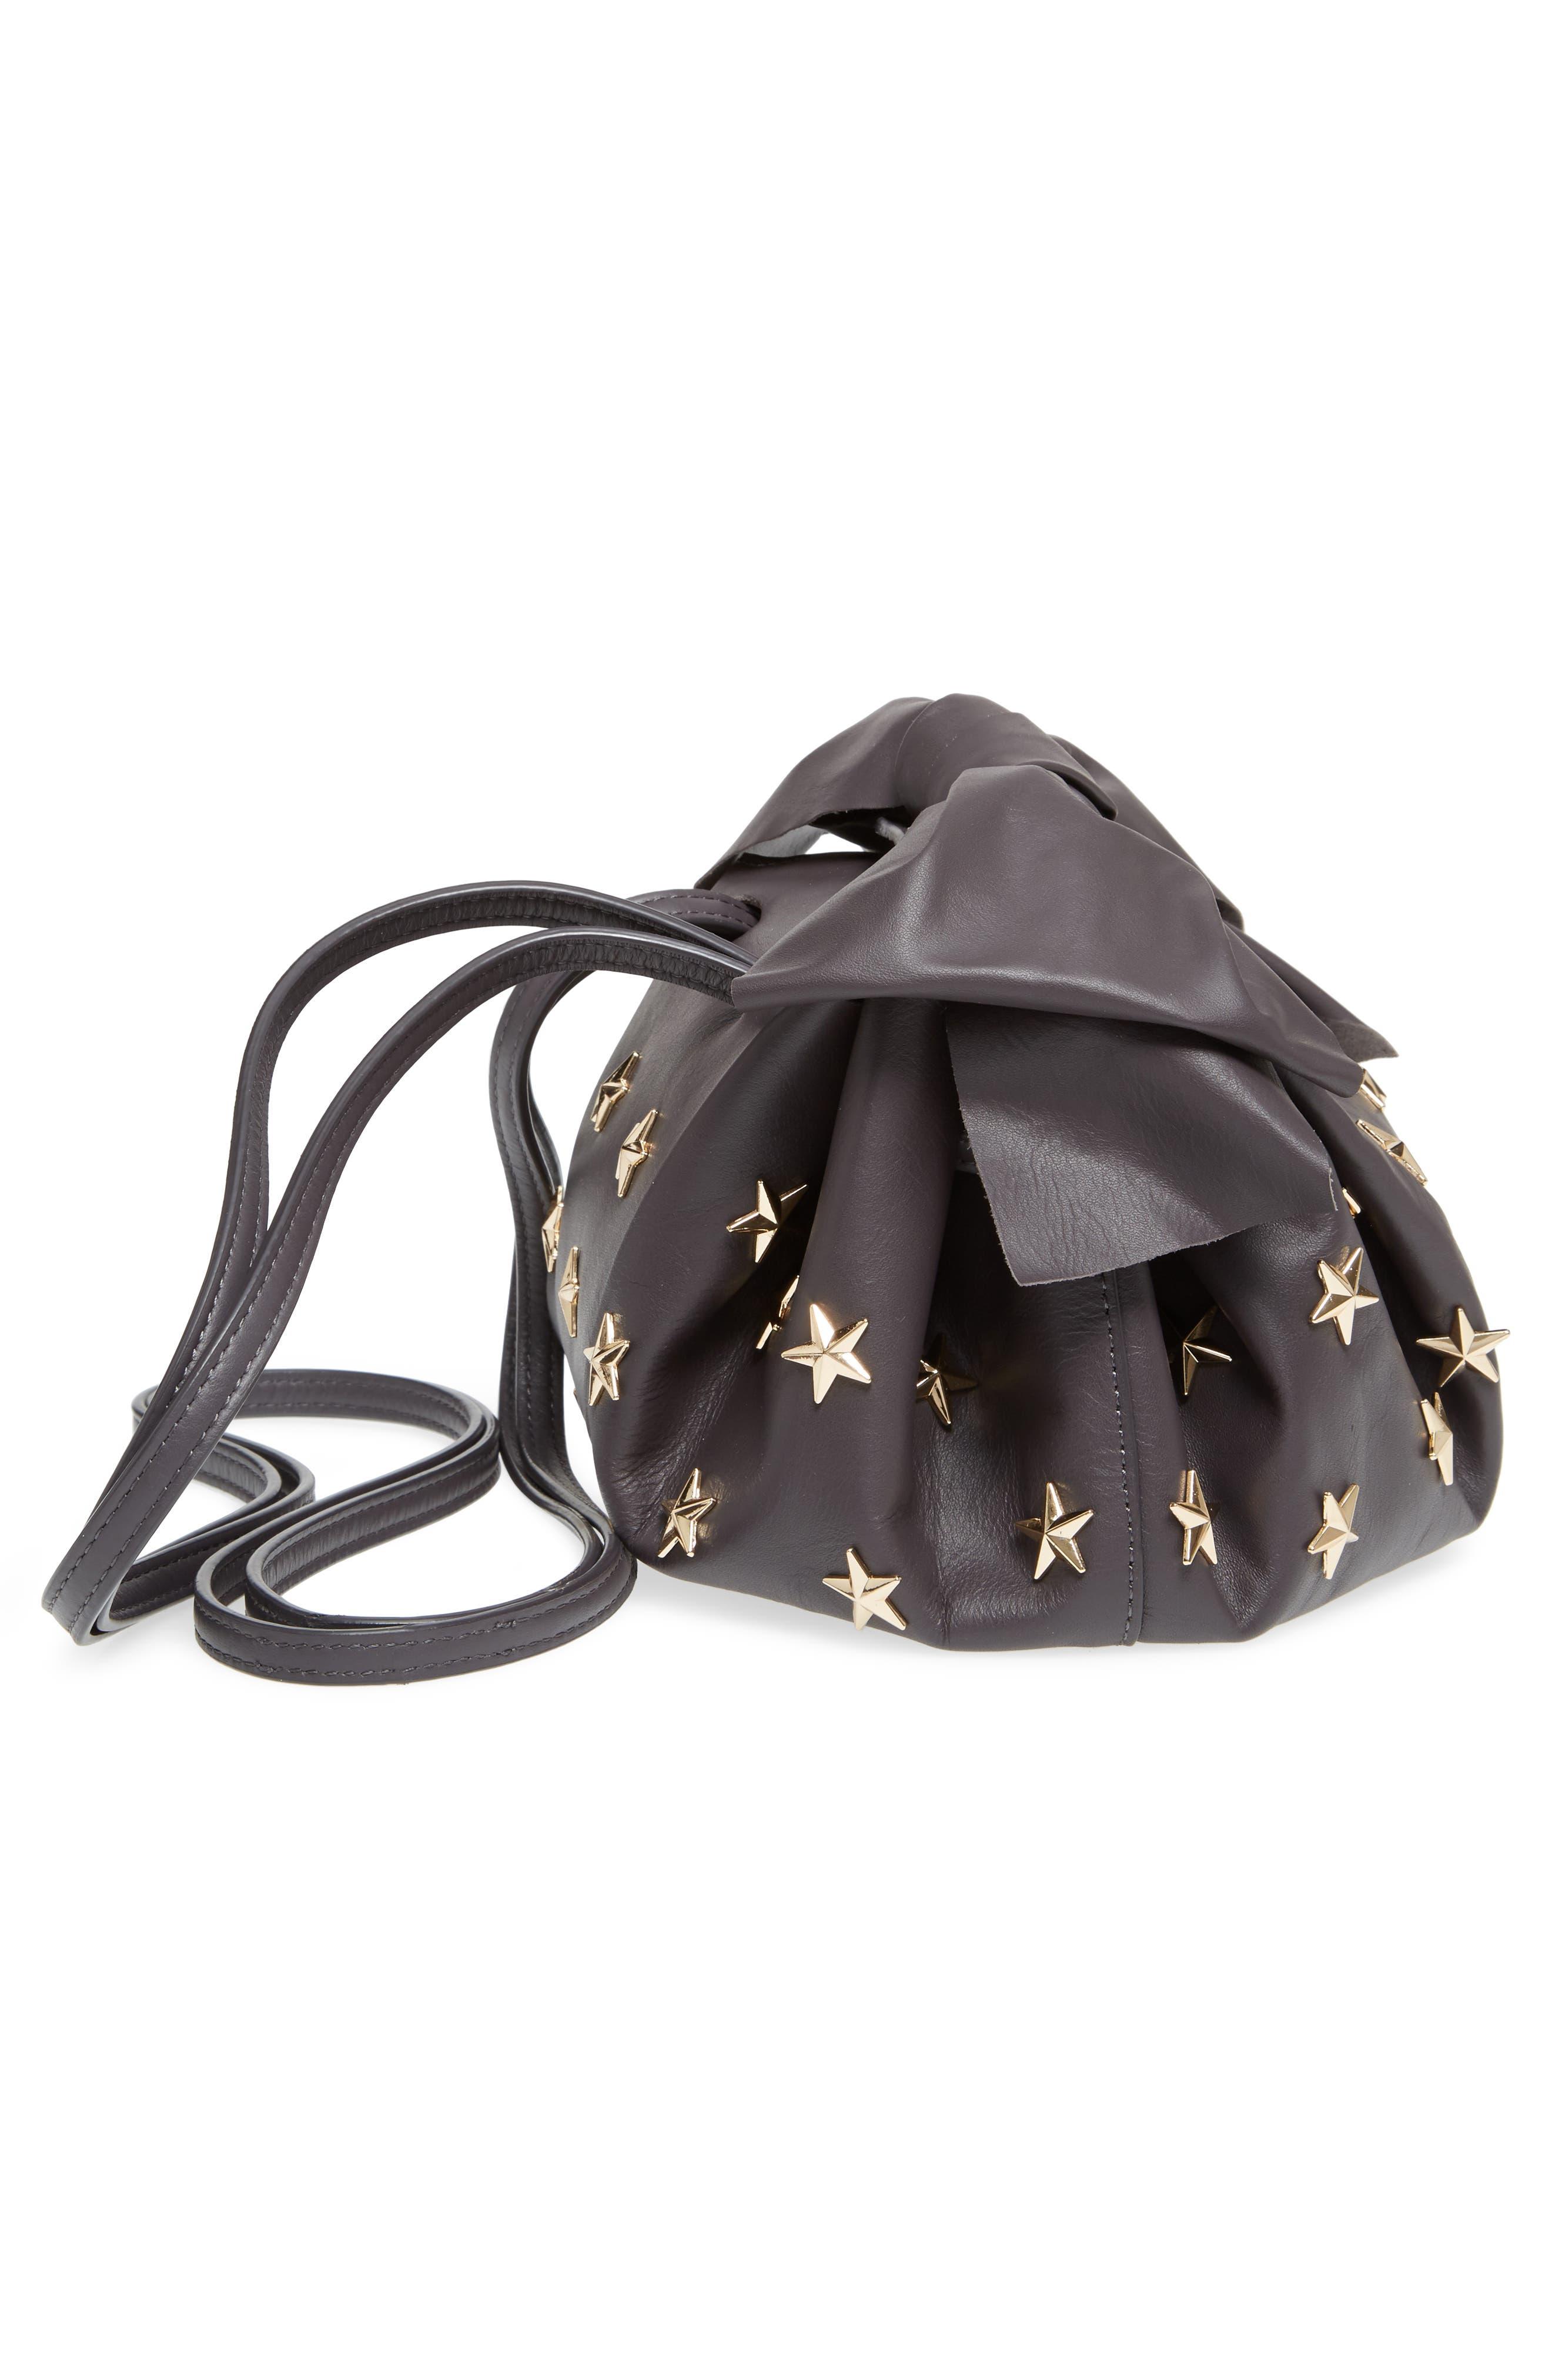 Soirée Star Stud Leather Crossbody Bag,                             Alternate thumbnail 5, color,                             020